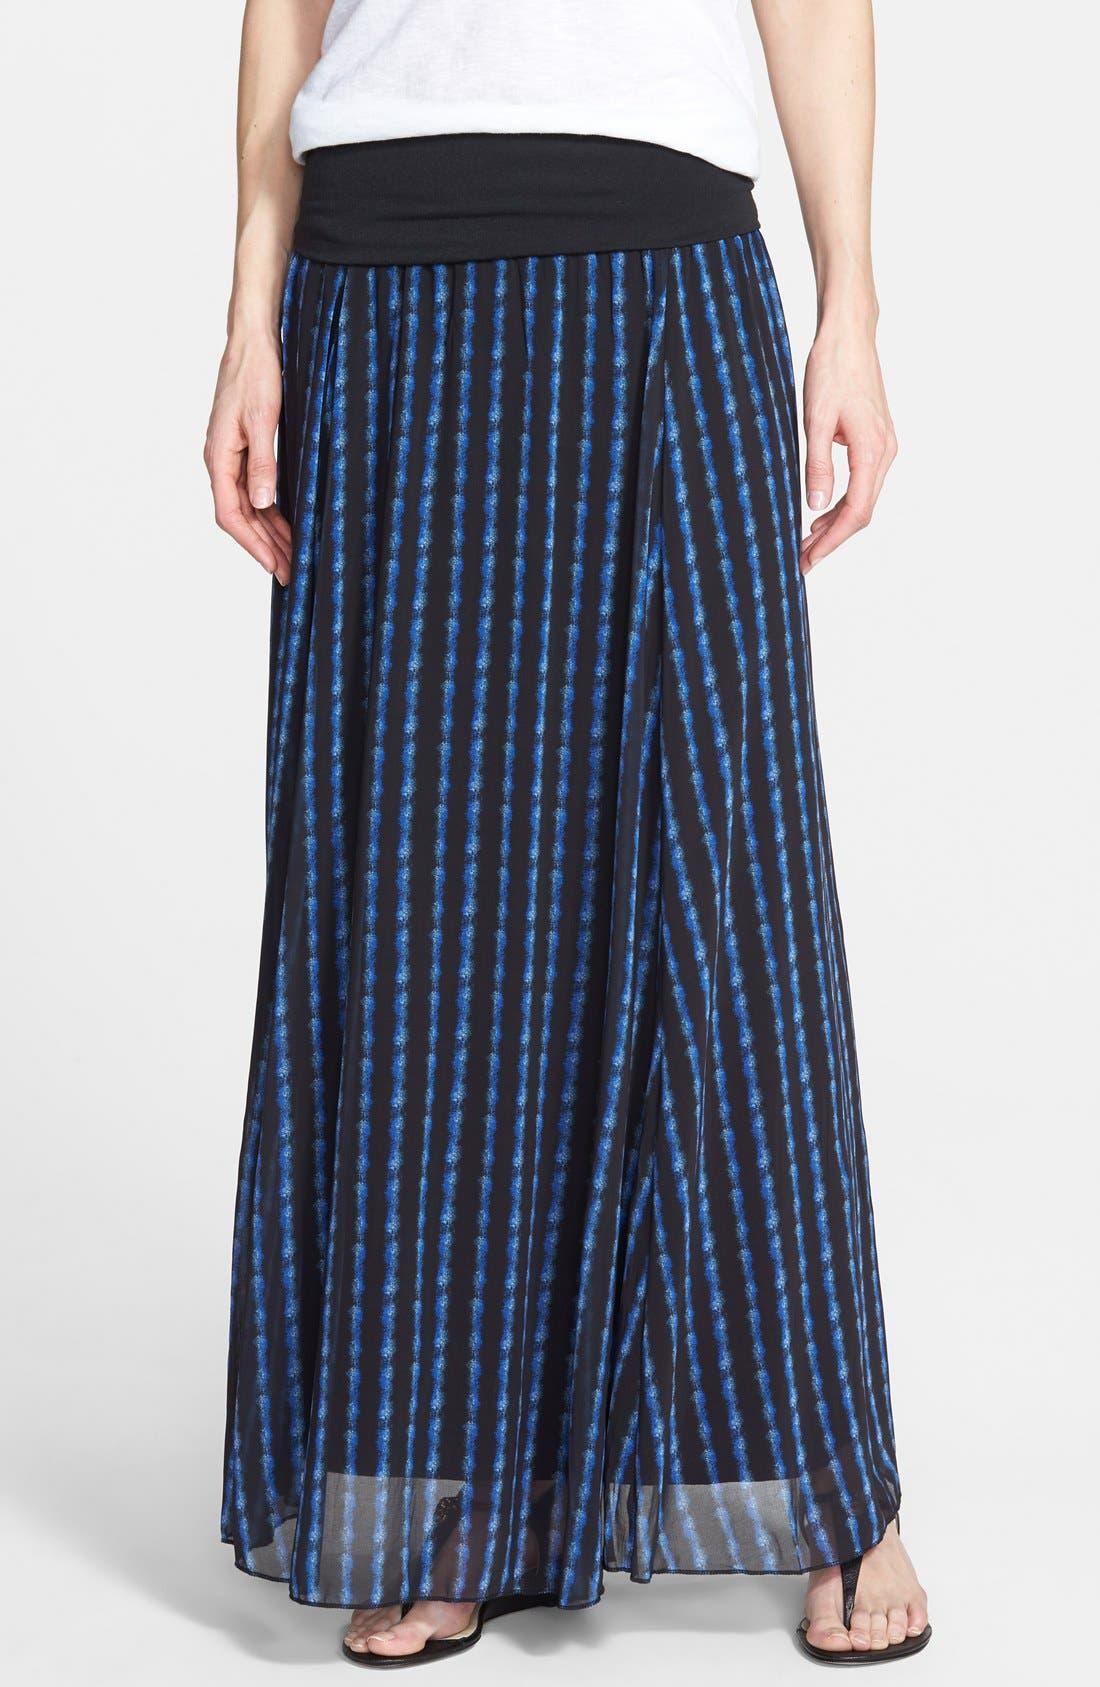 Main Image - Max & Mia Knit Waistband Print Maxi Skirt